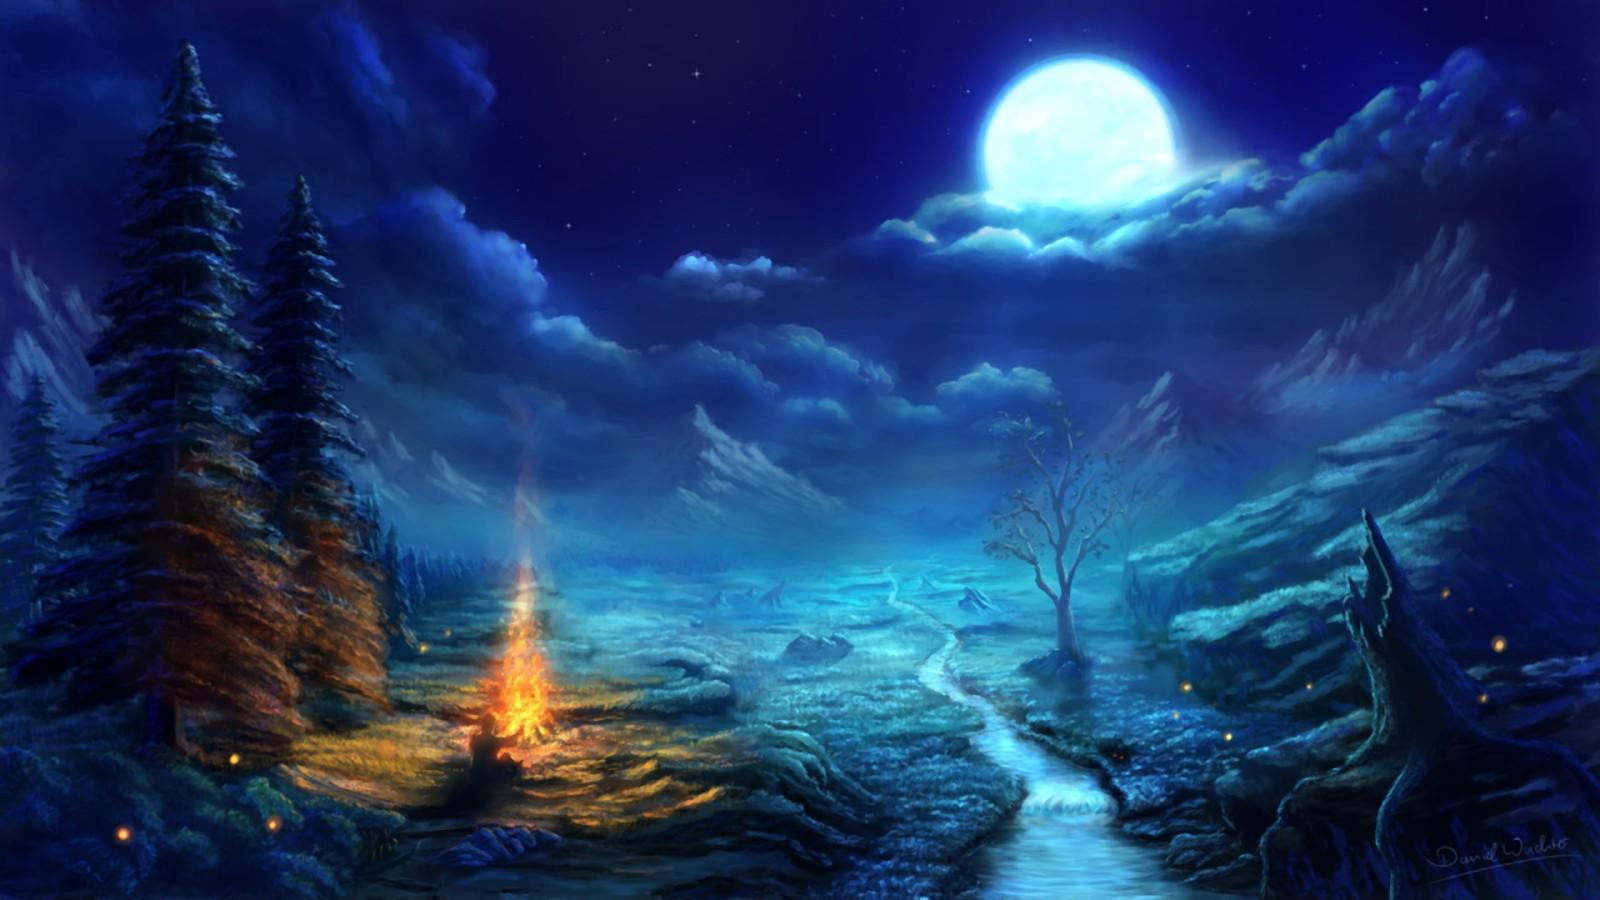 General 1600x900 digital art fantasy art nature night Moon trees pine trees stream dead trees